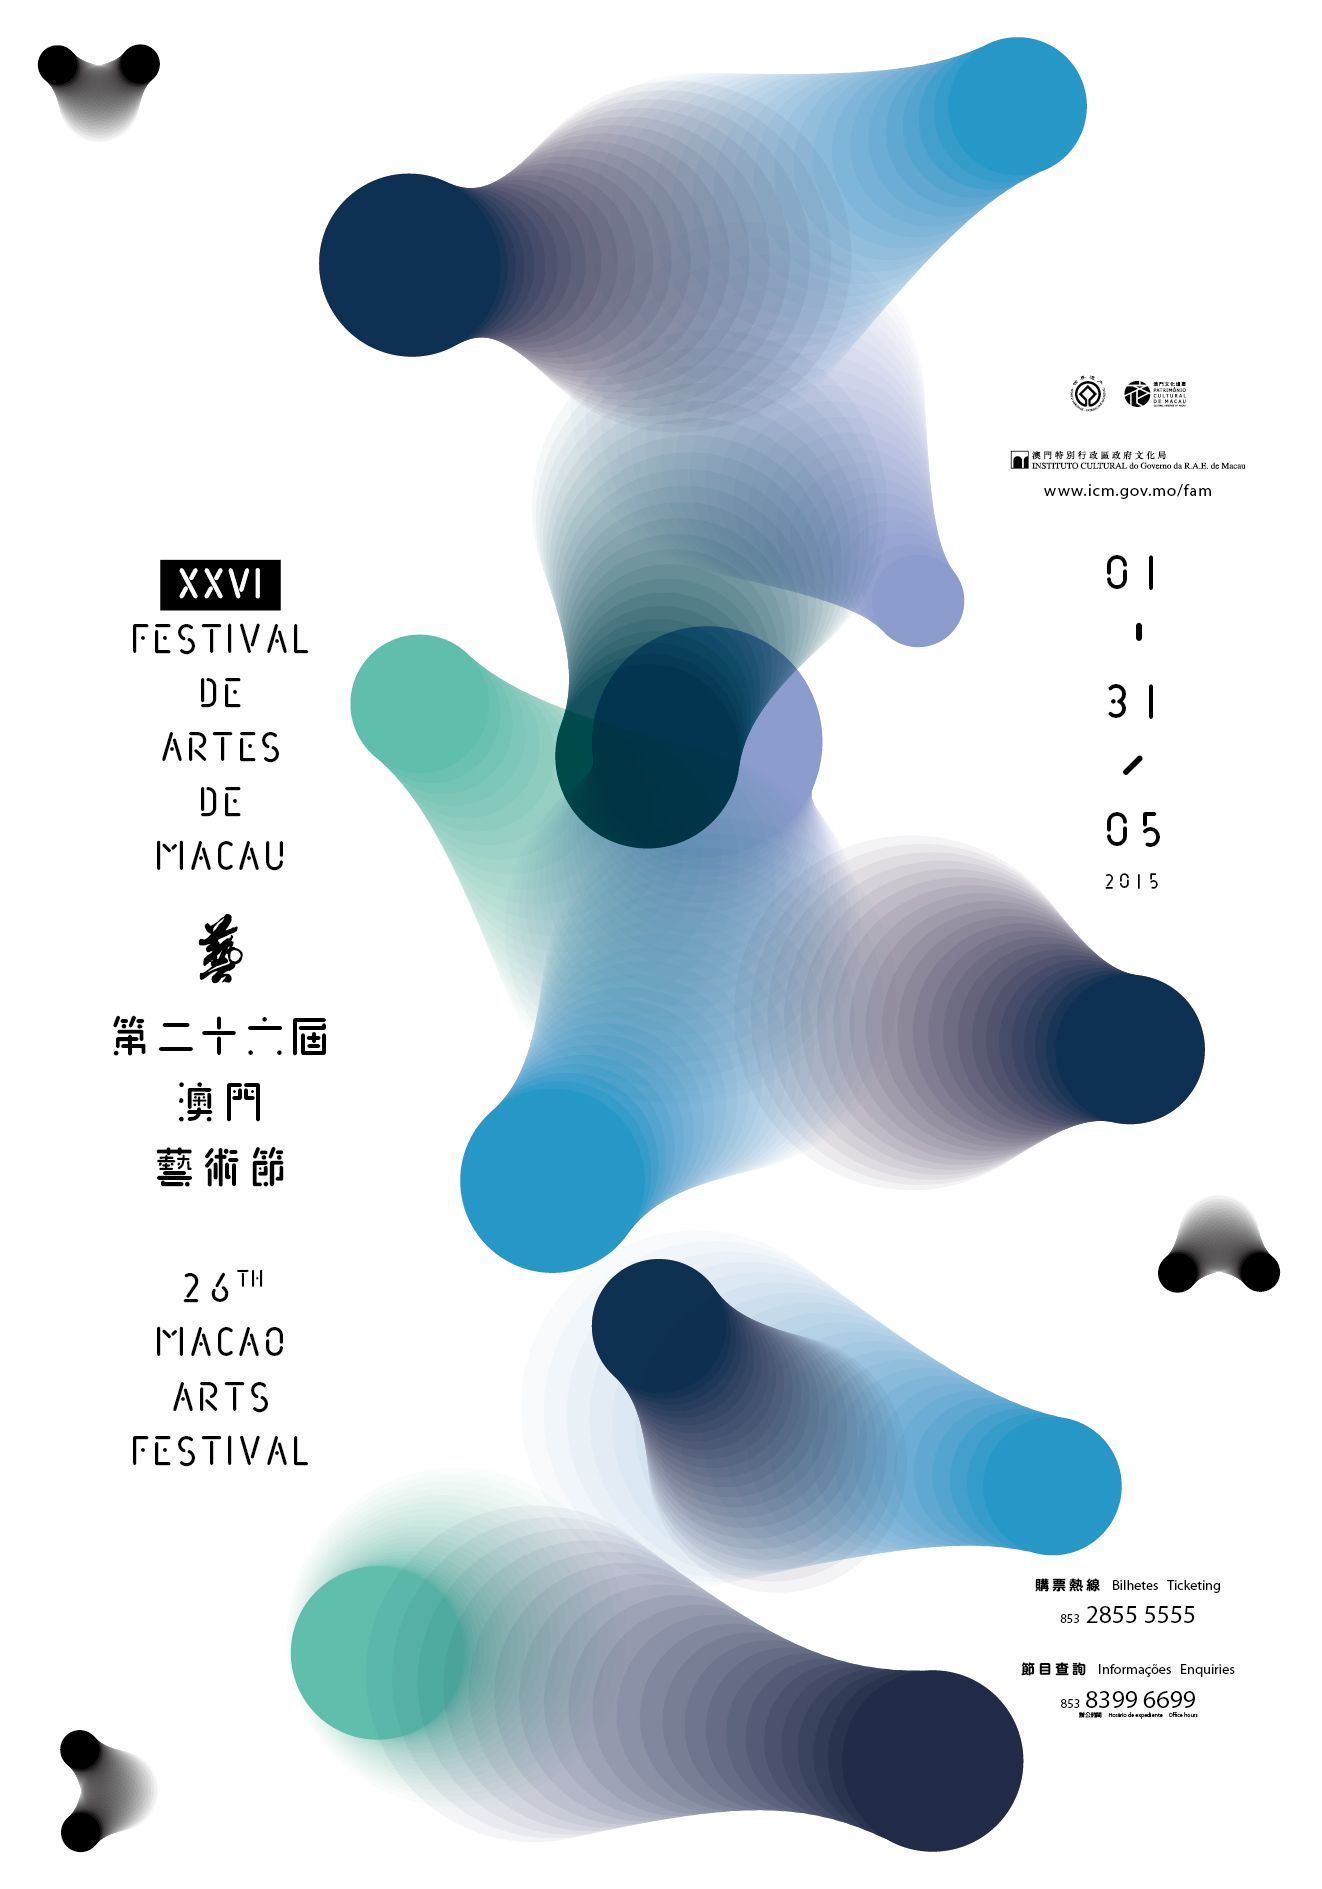 macao arts festival 2015 d grad de formes par tapes. Black Bedroom Furniture Sets. Home Design Ideas